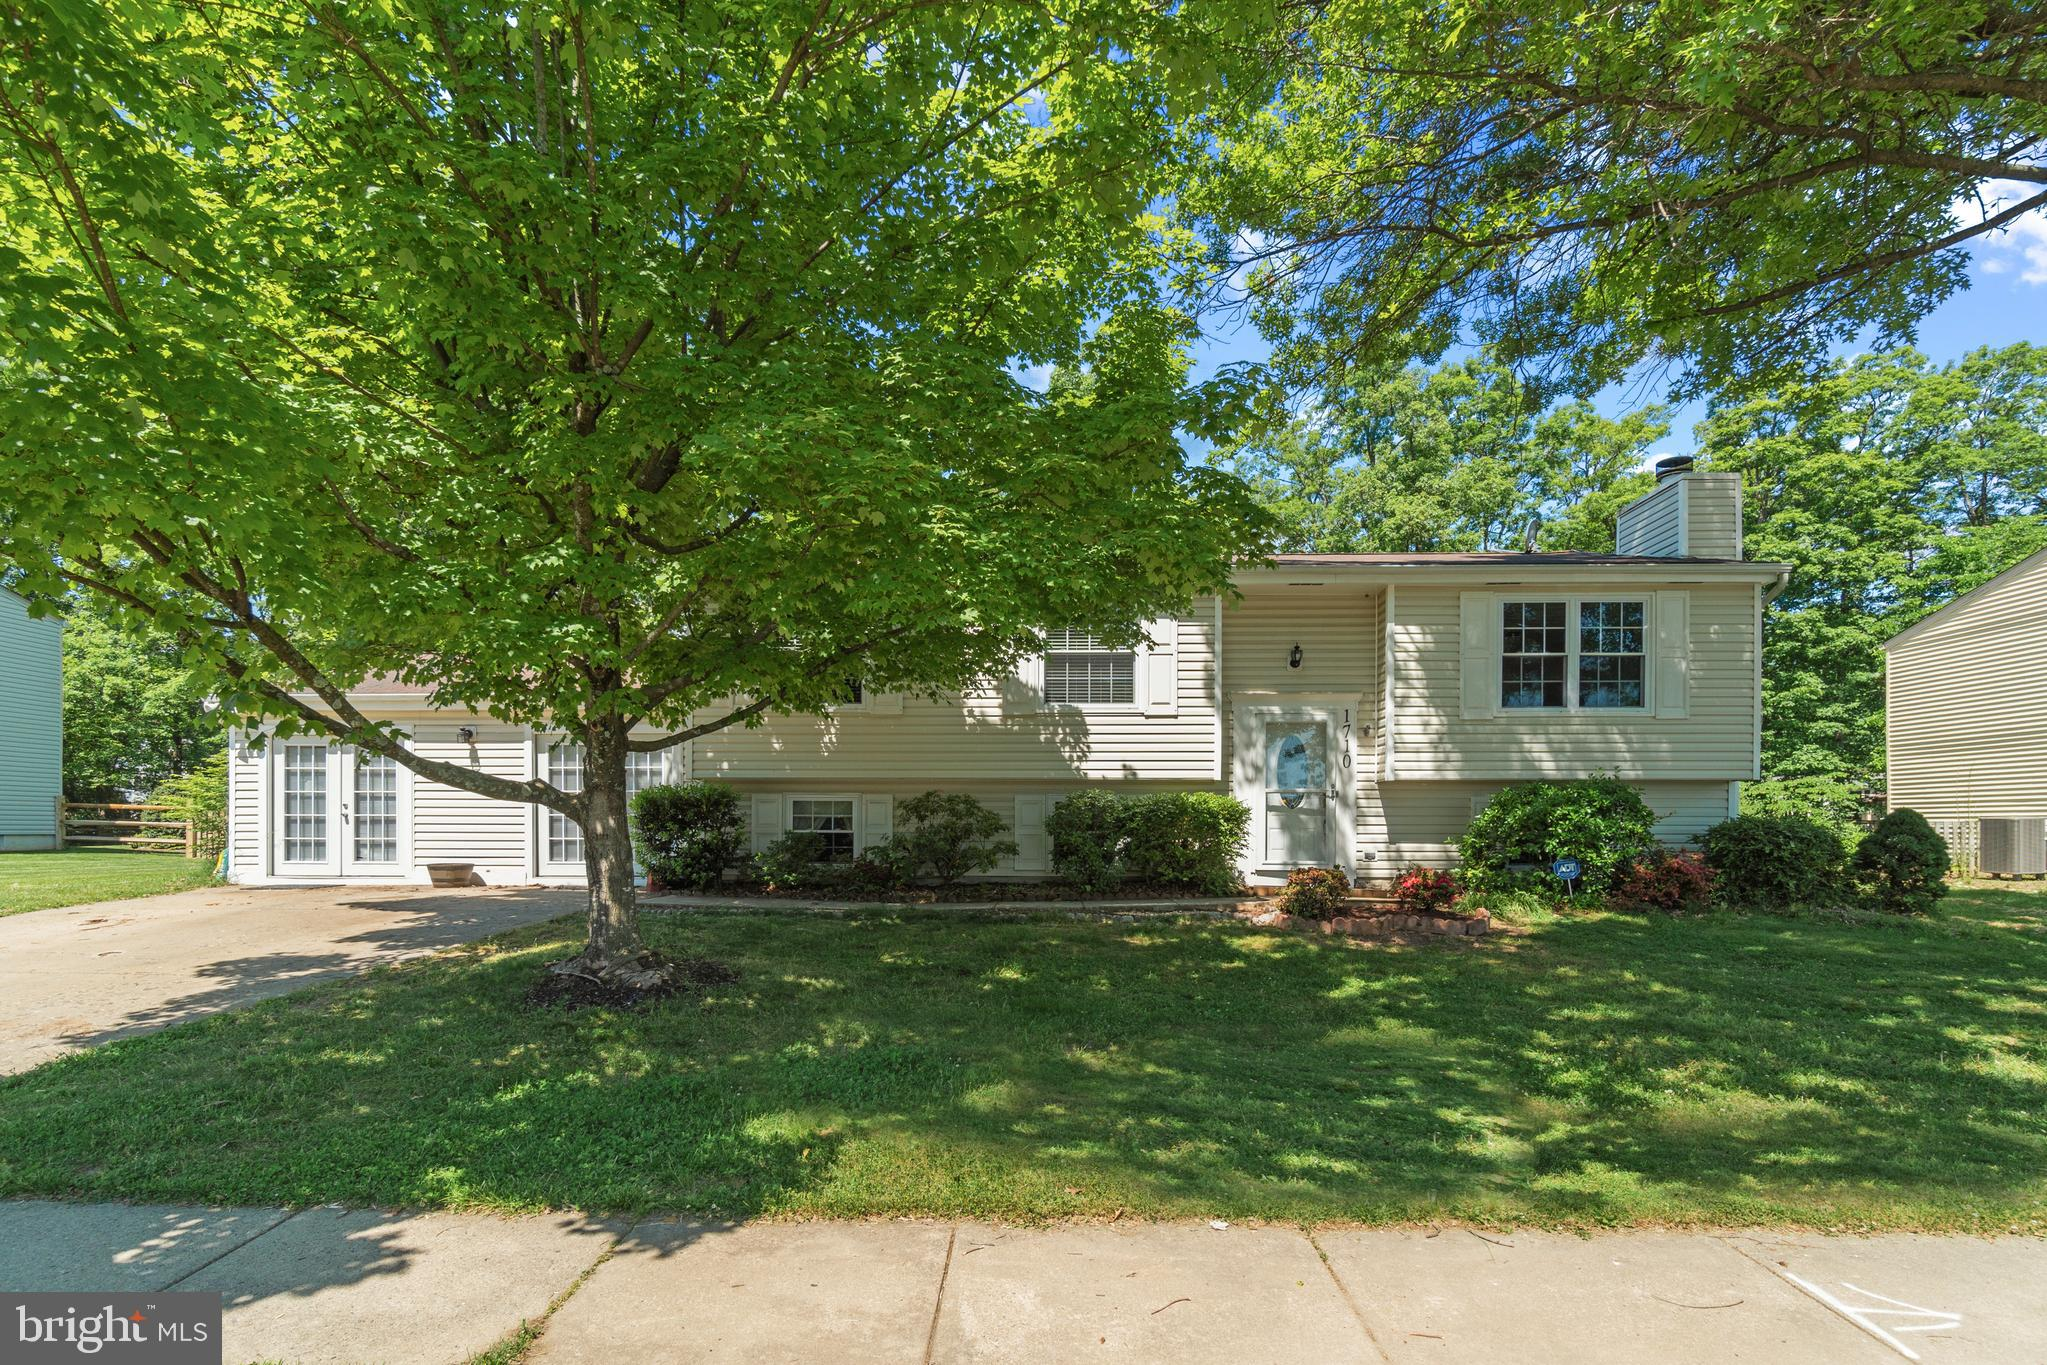 1710 Whitewood Ln, Herndon, VA, 20170